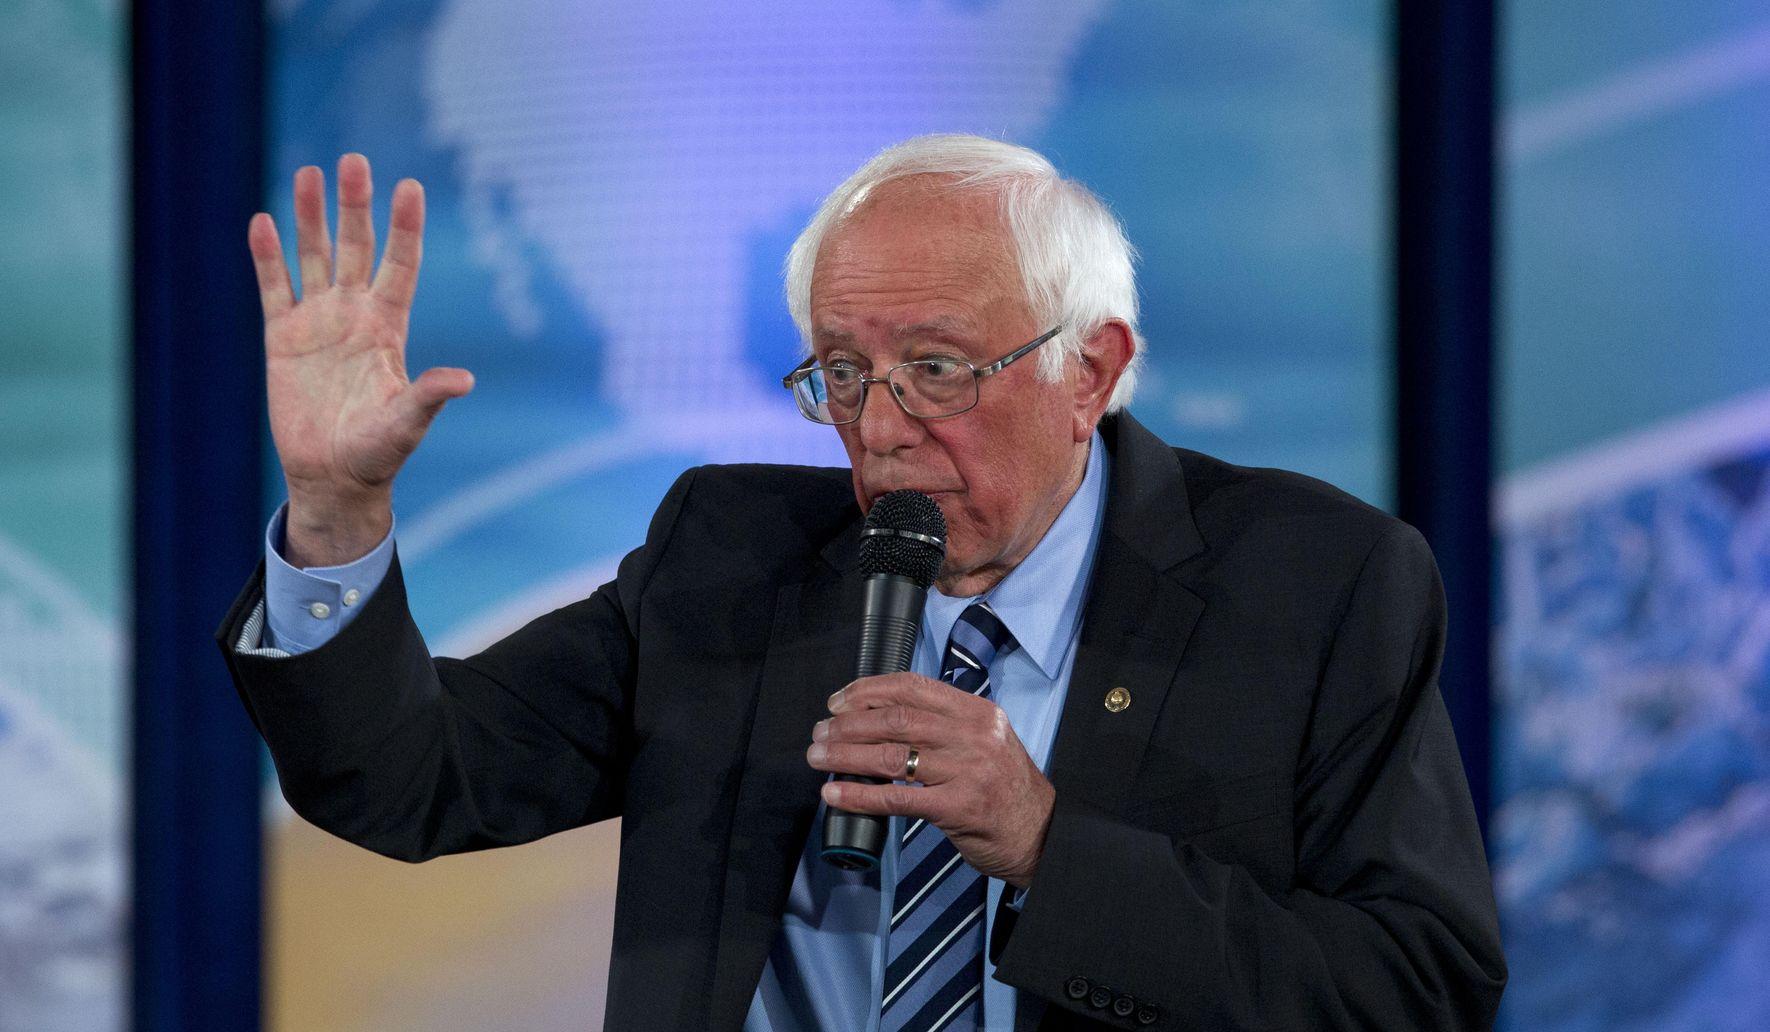 Bernie Sanders winning with Latino voters, Joe Biden a close second: Poll